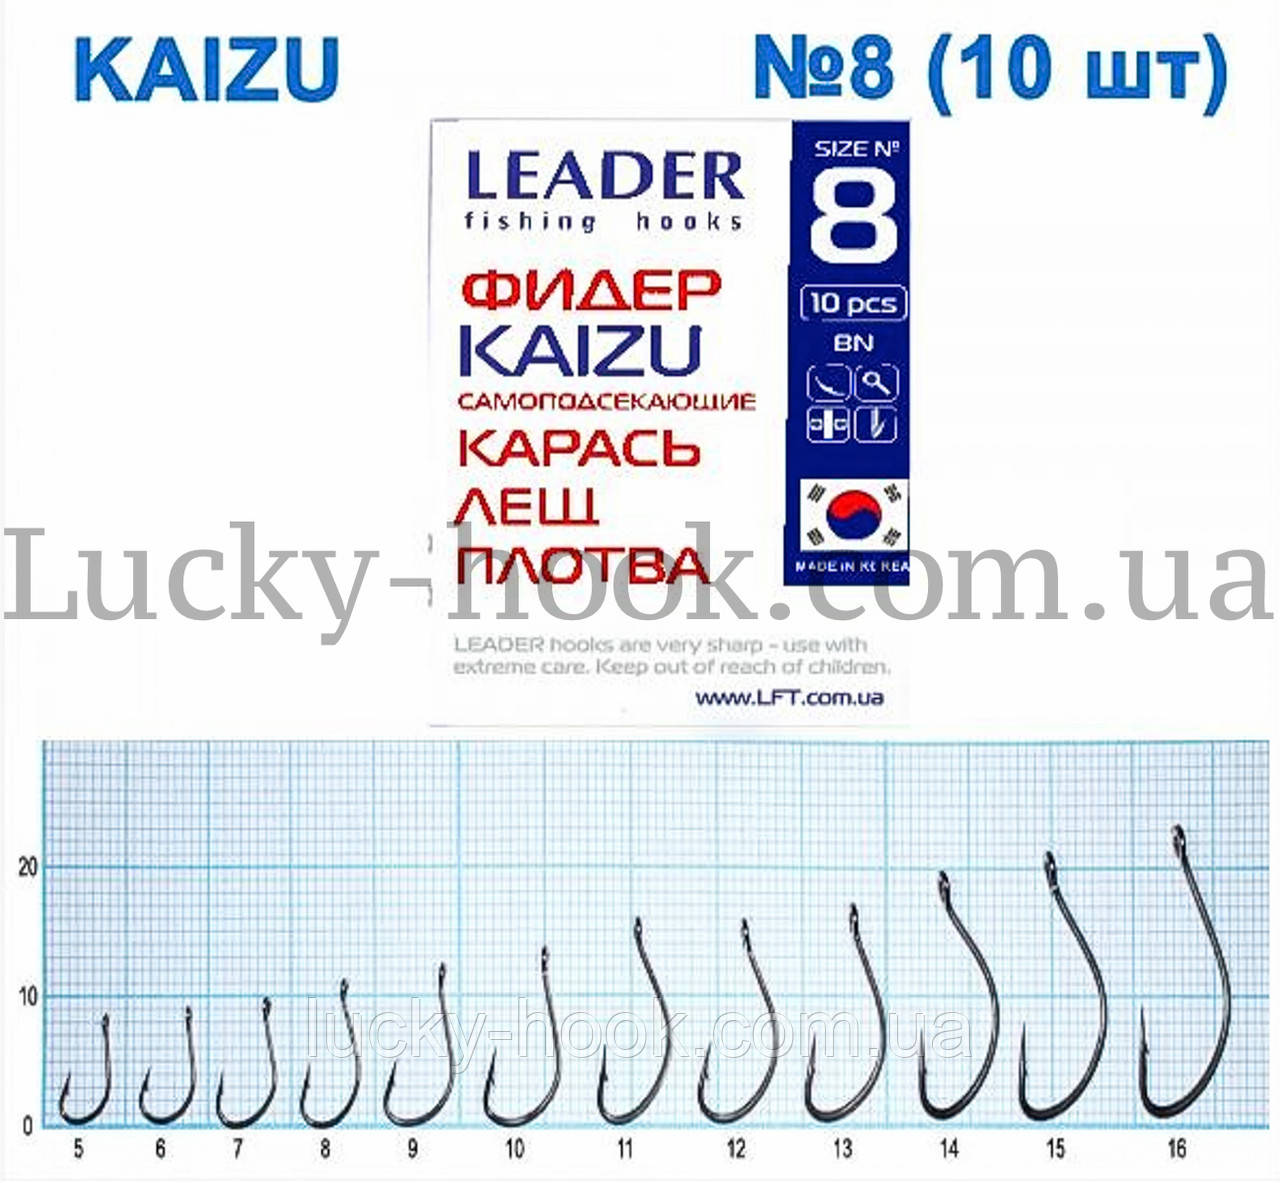 Крючок Leader KAIZU Фидер  самоподсекающие (Карась, лещ, плотва)  № 8